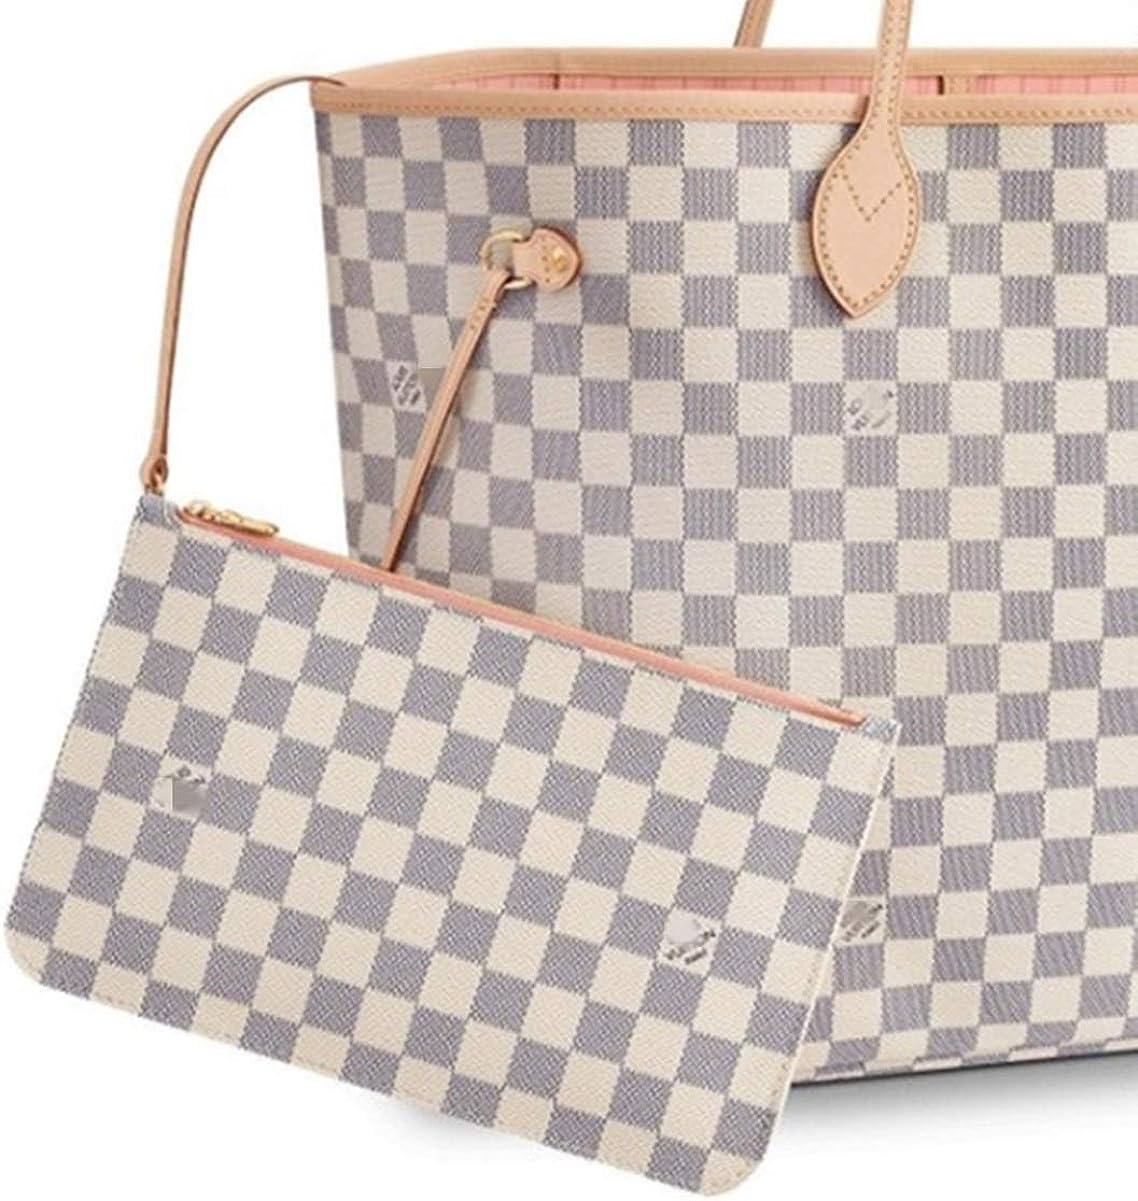 Pink 32x29x17cm Leather House Monogram Canvas Kimono PM Cherry//Noir//Taupe Glace Shoulder Handbag for women White